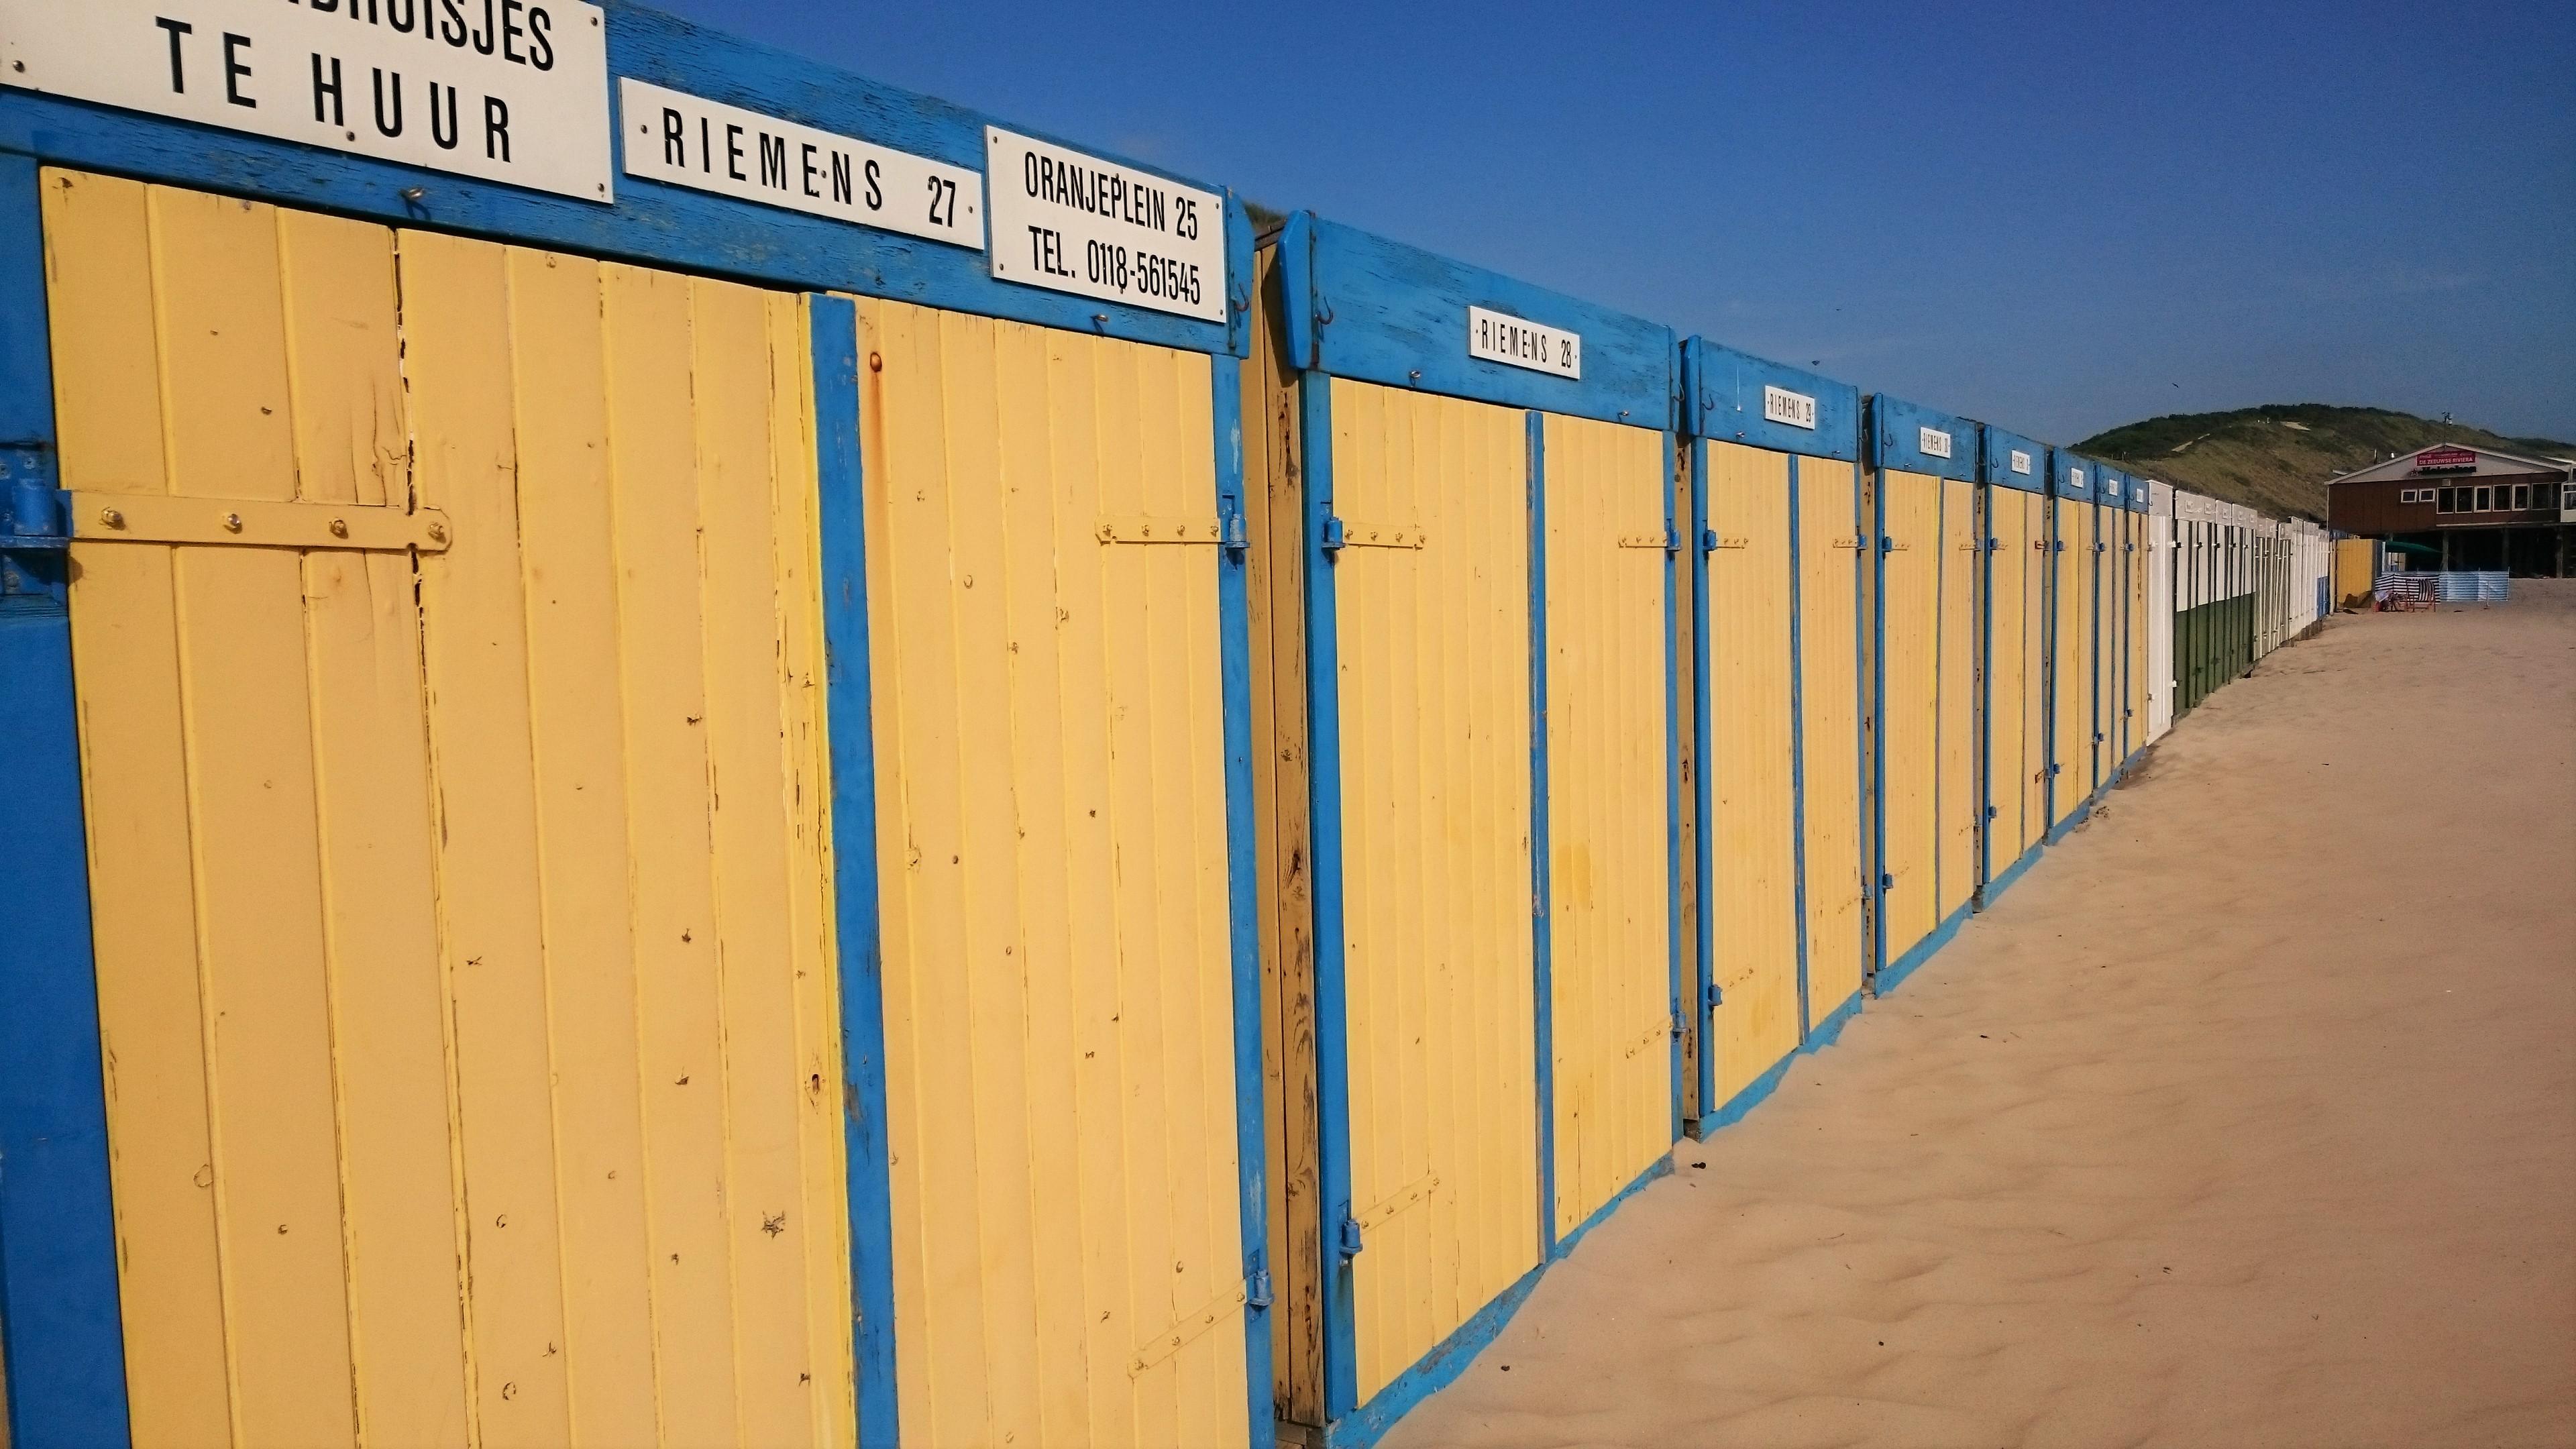 Riemens strandhuisjesverhuur | strandhuisjes.com